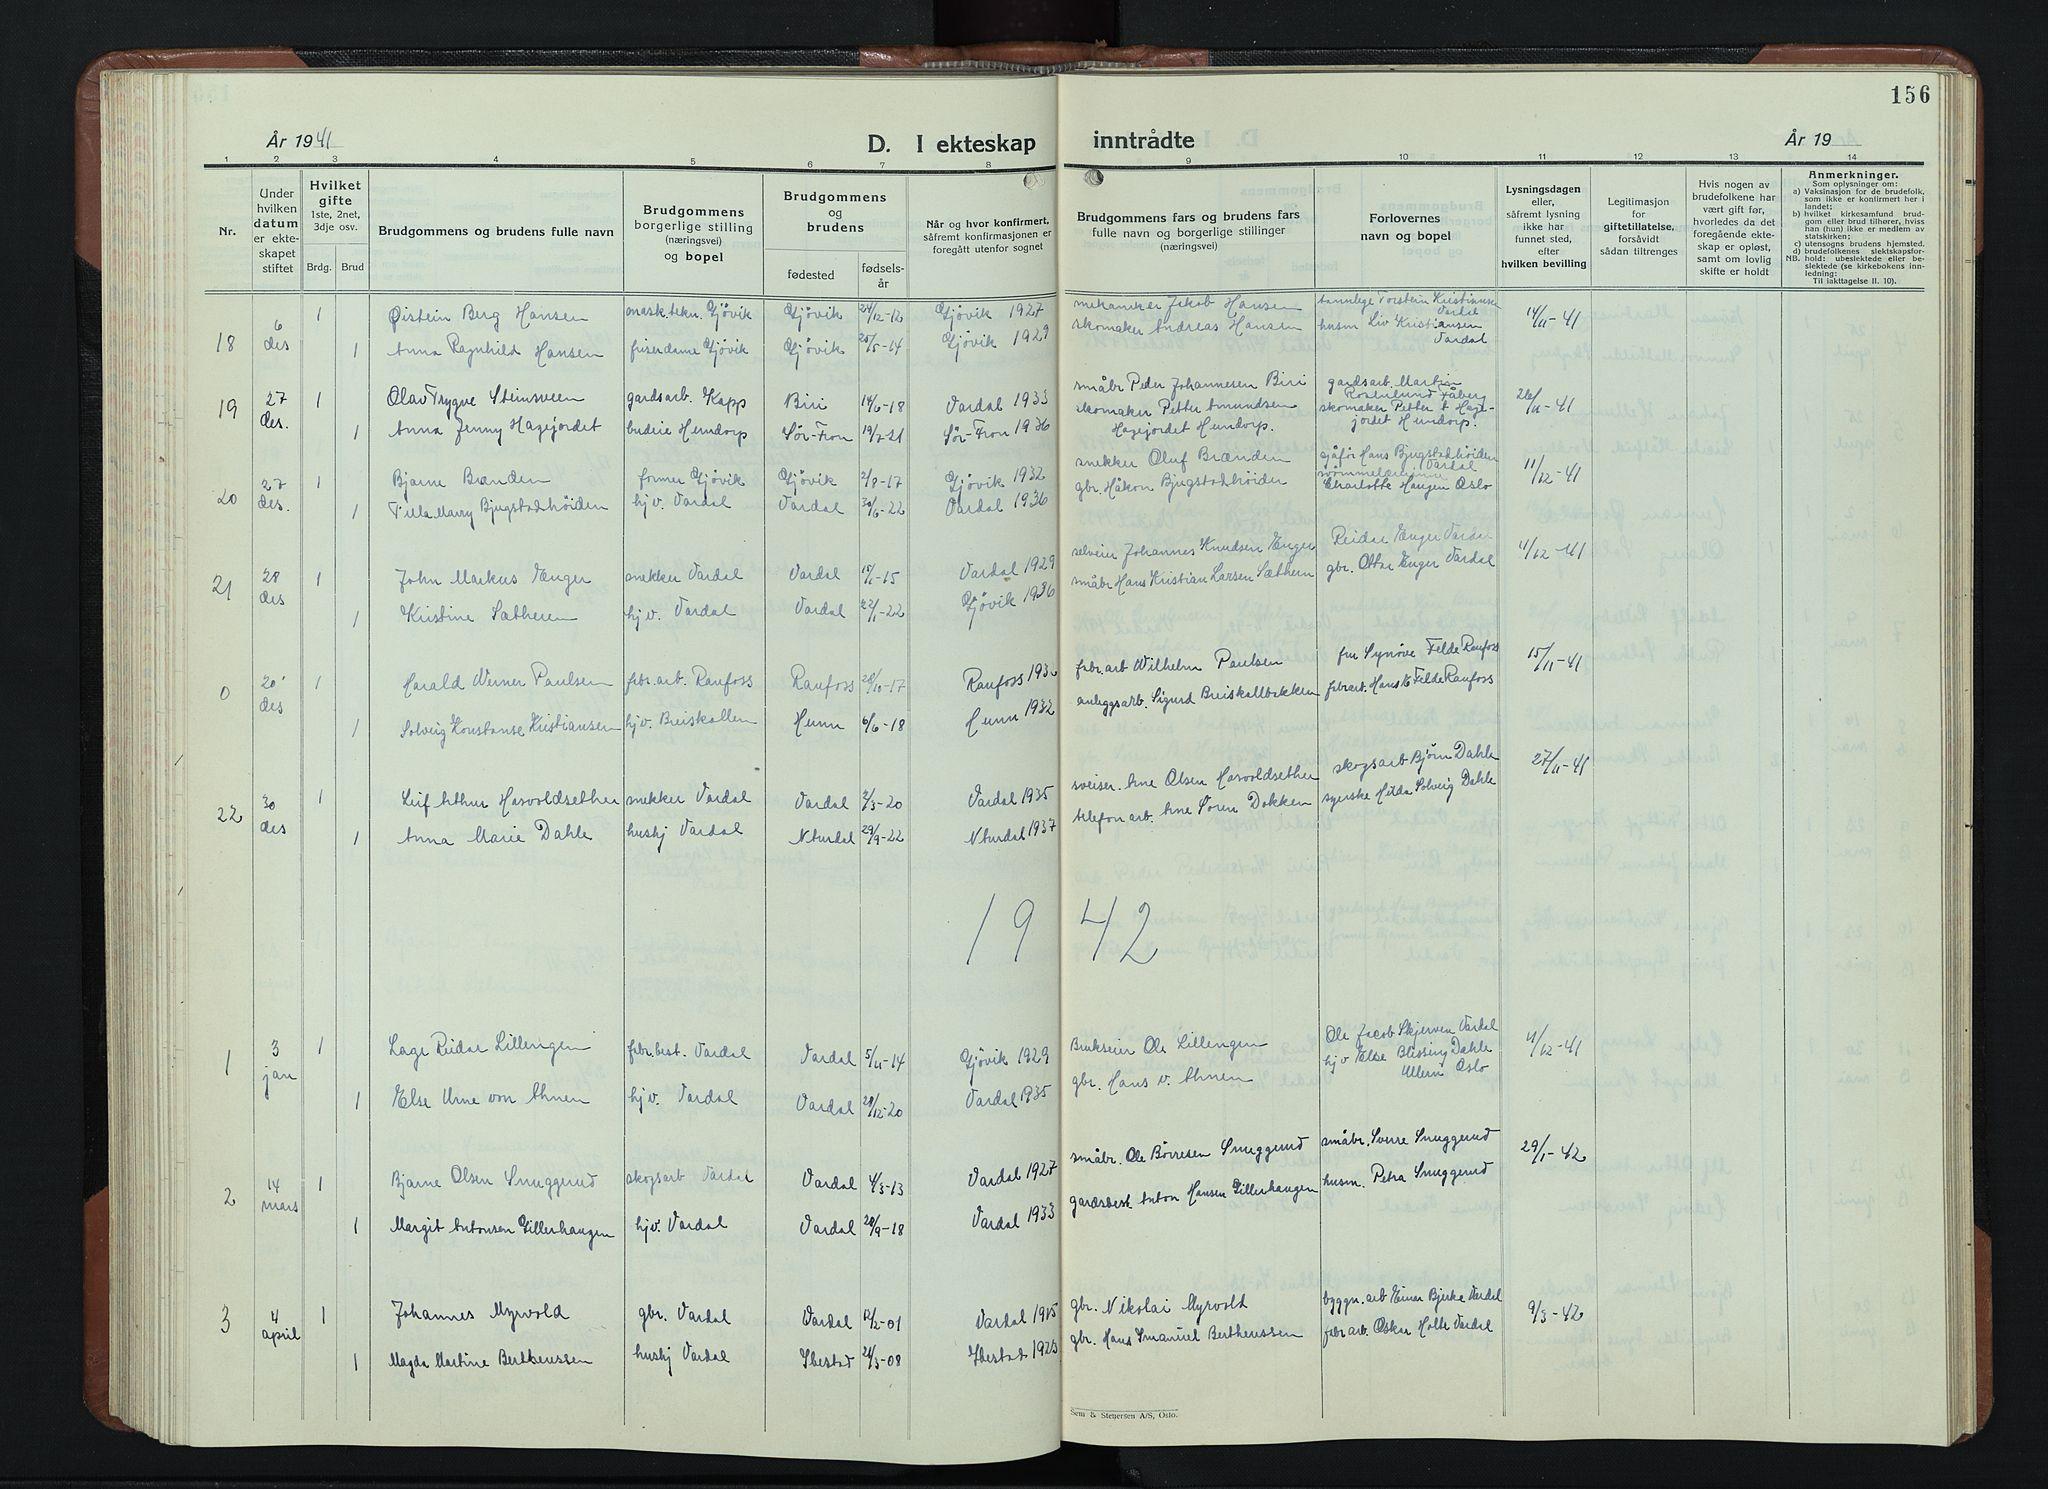 SAH, Vardal prestekontor, H/Ha/Hab/L0018: Klokkerbok nr. 18, 1931-1951, s. 156